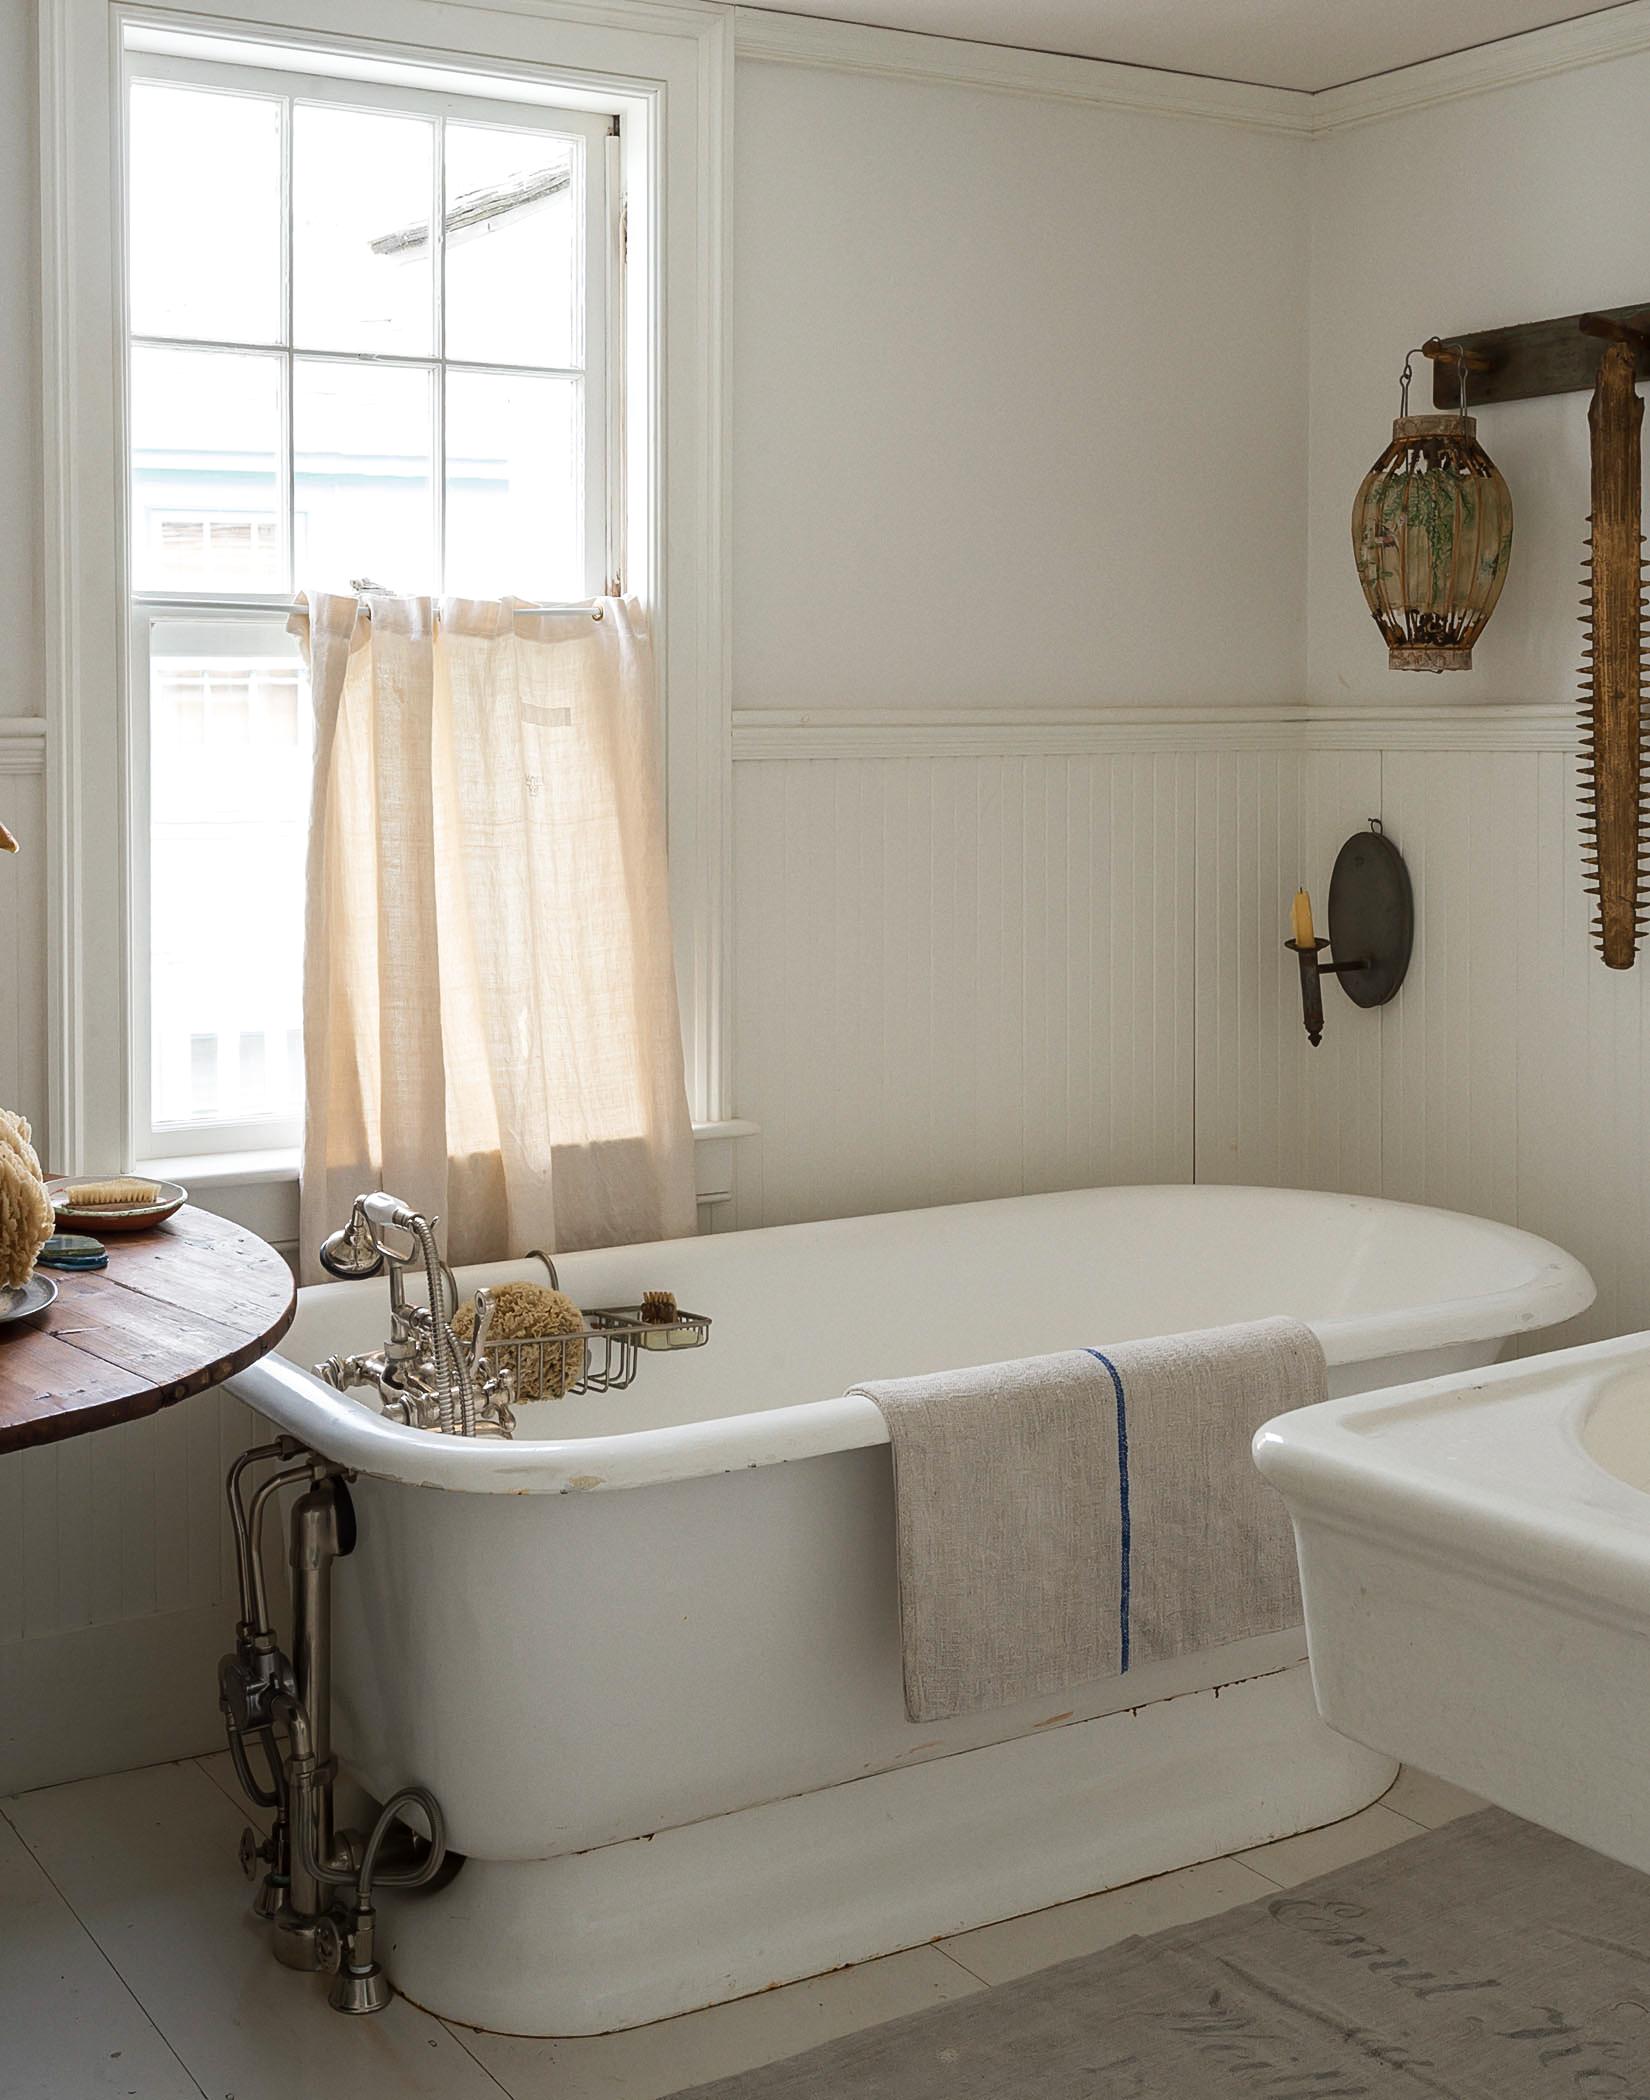 John-Derian-Bathroom-tub.jpg